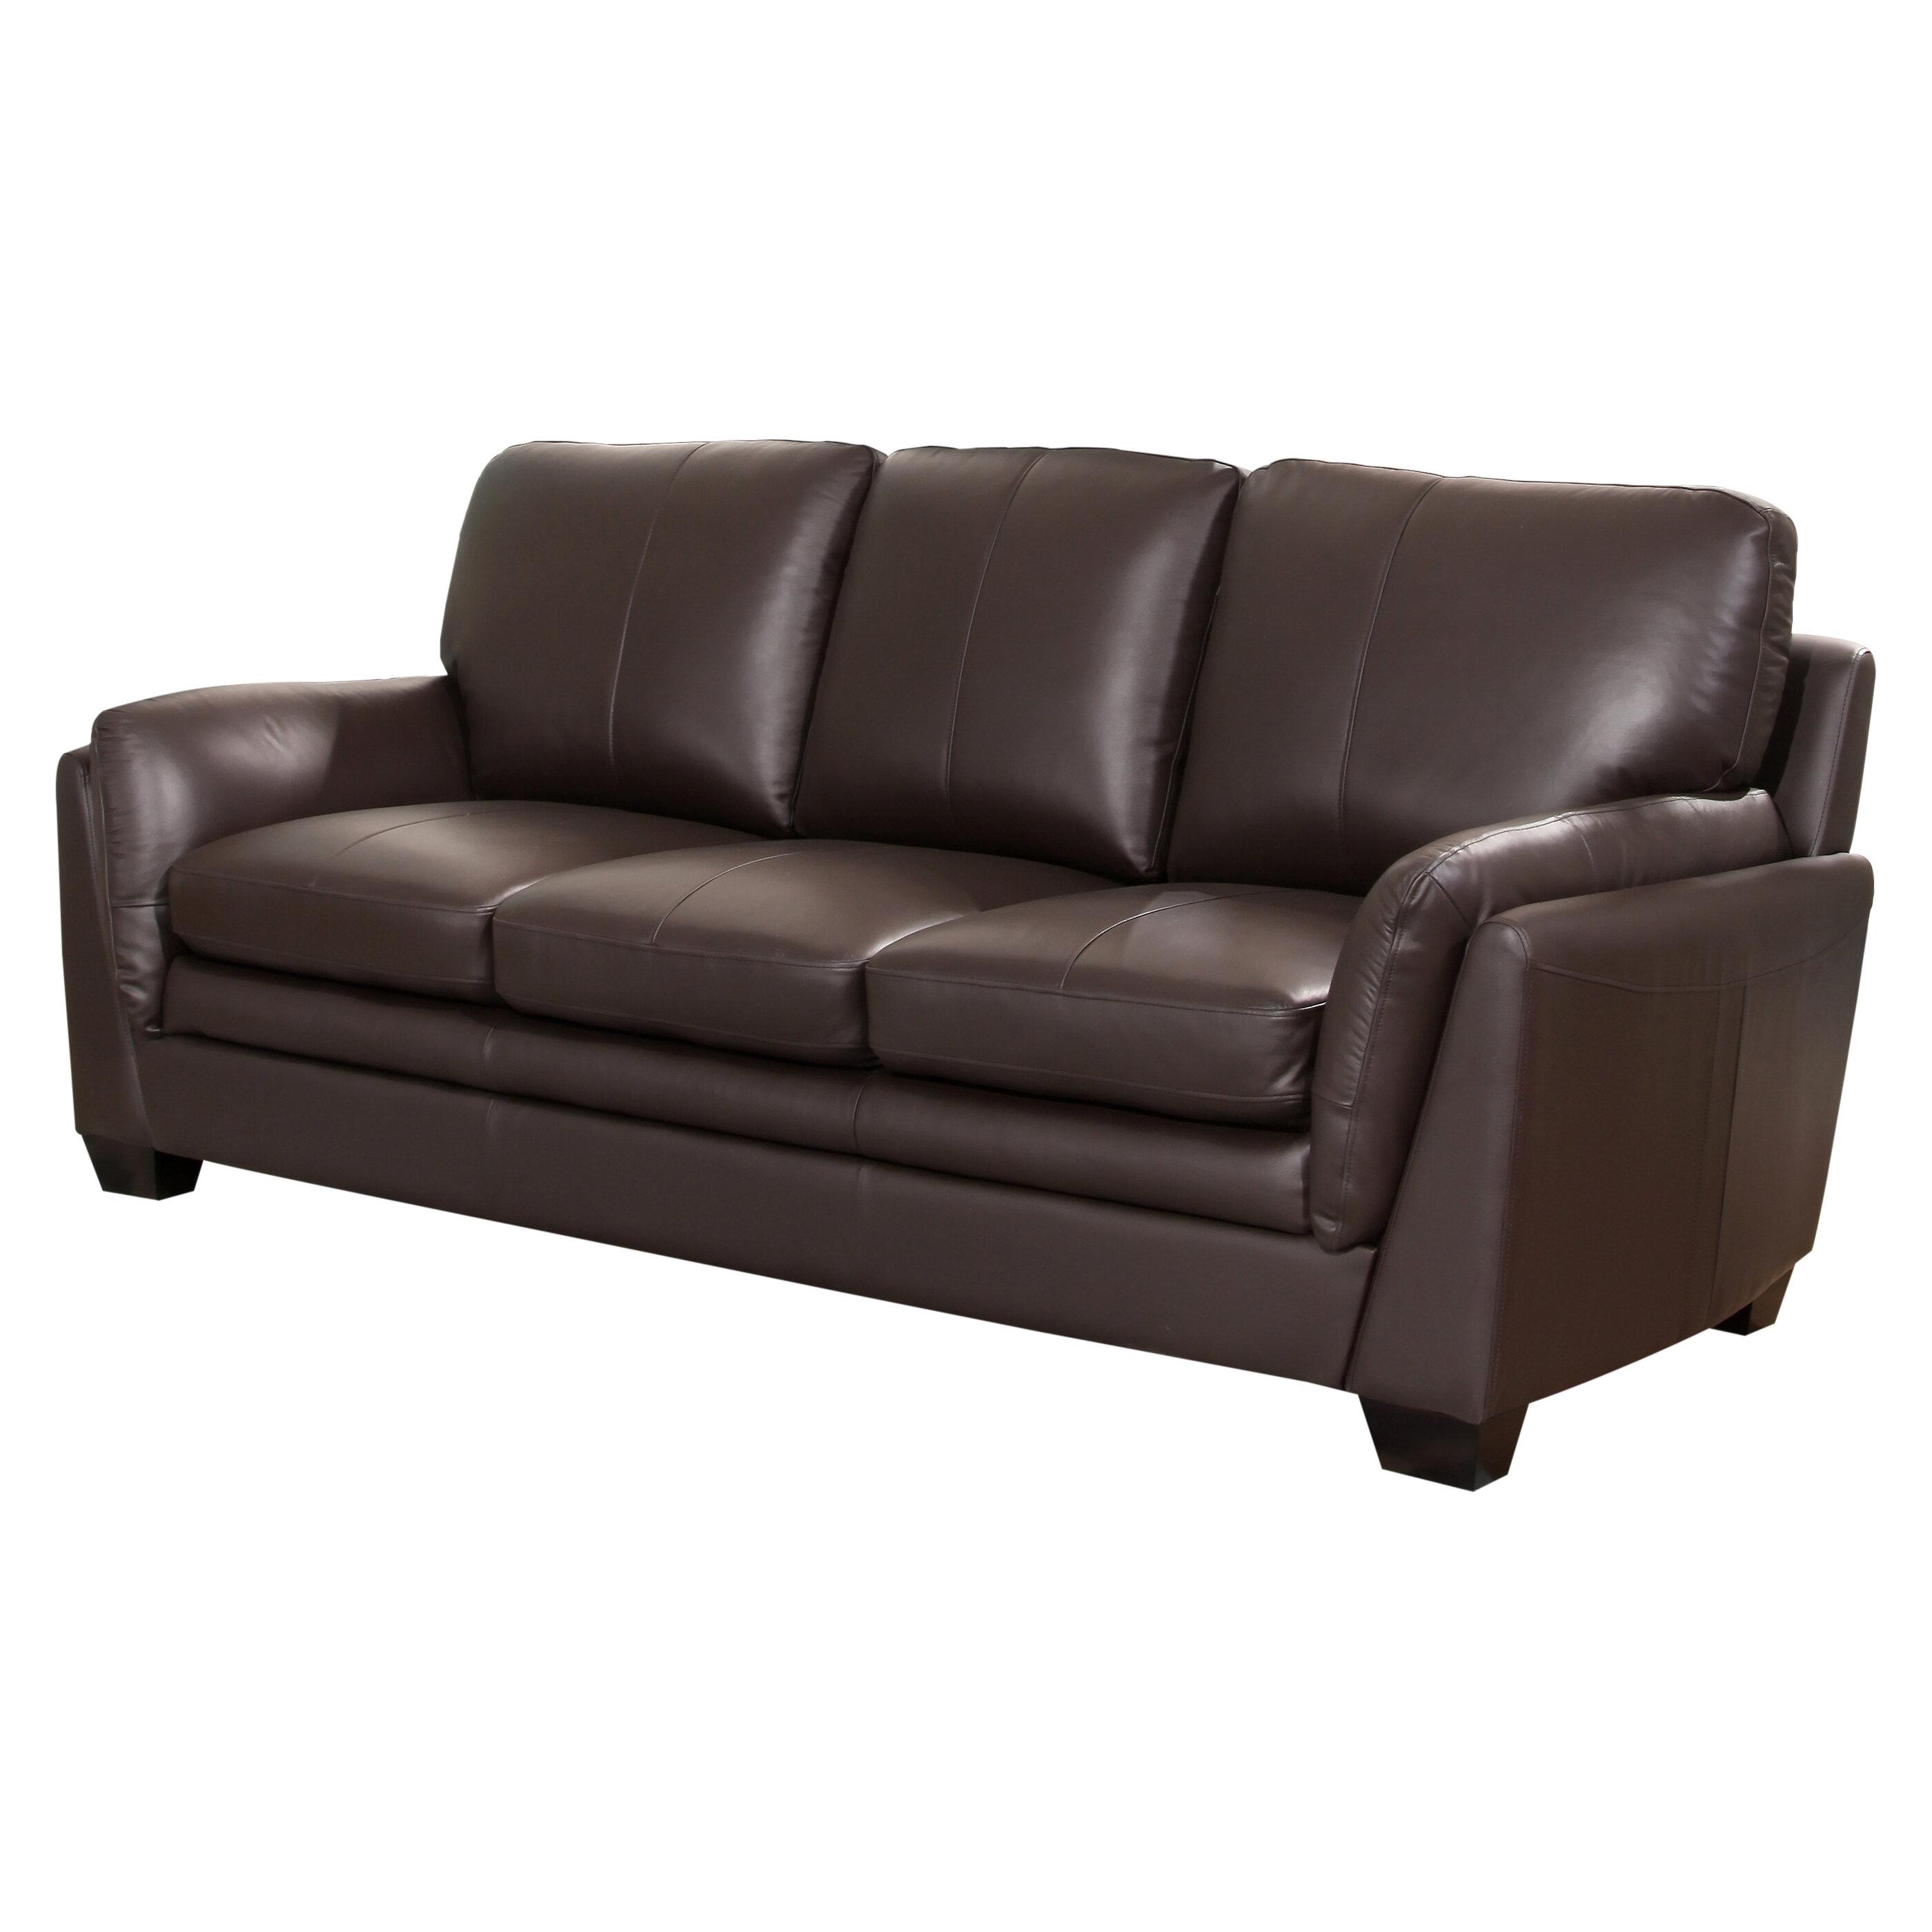 Beau Whitstran Leather Sofa